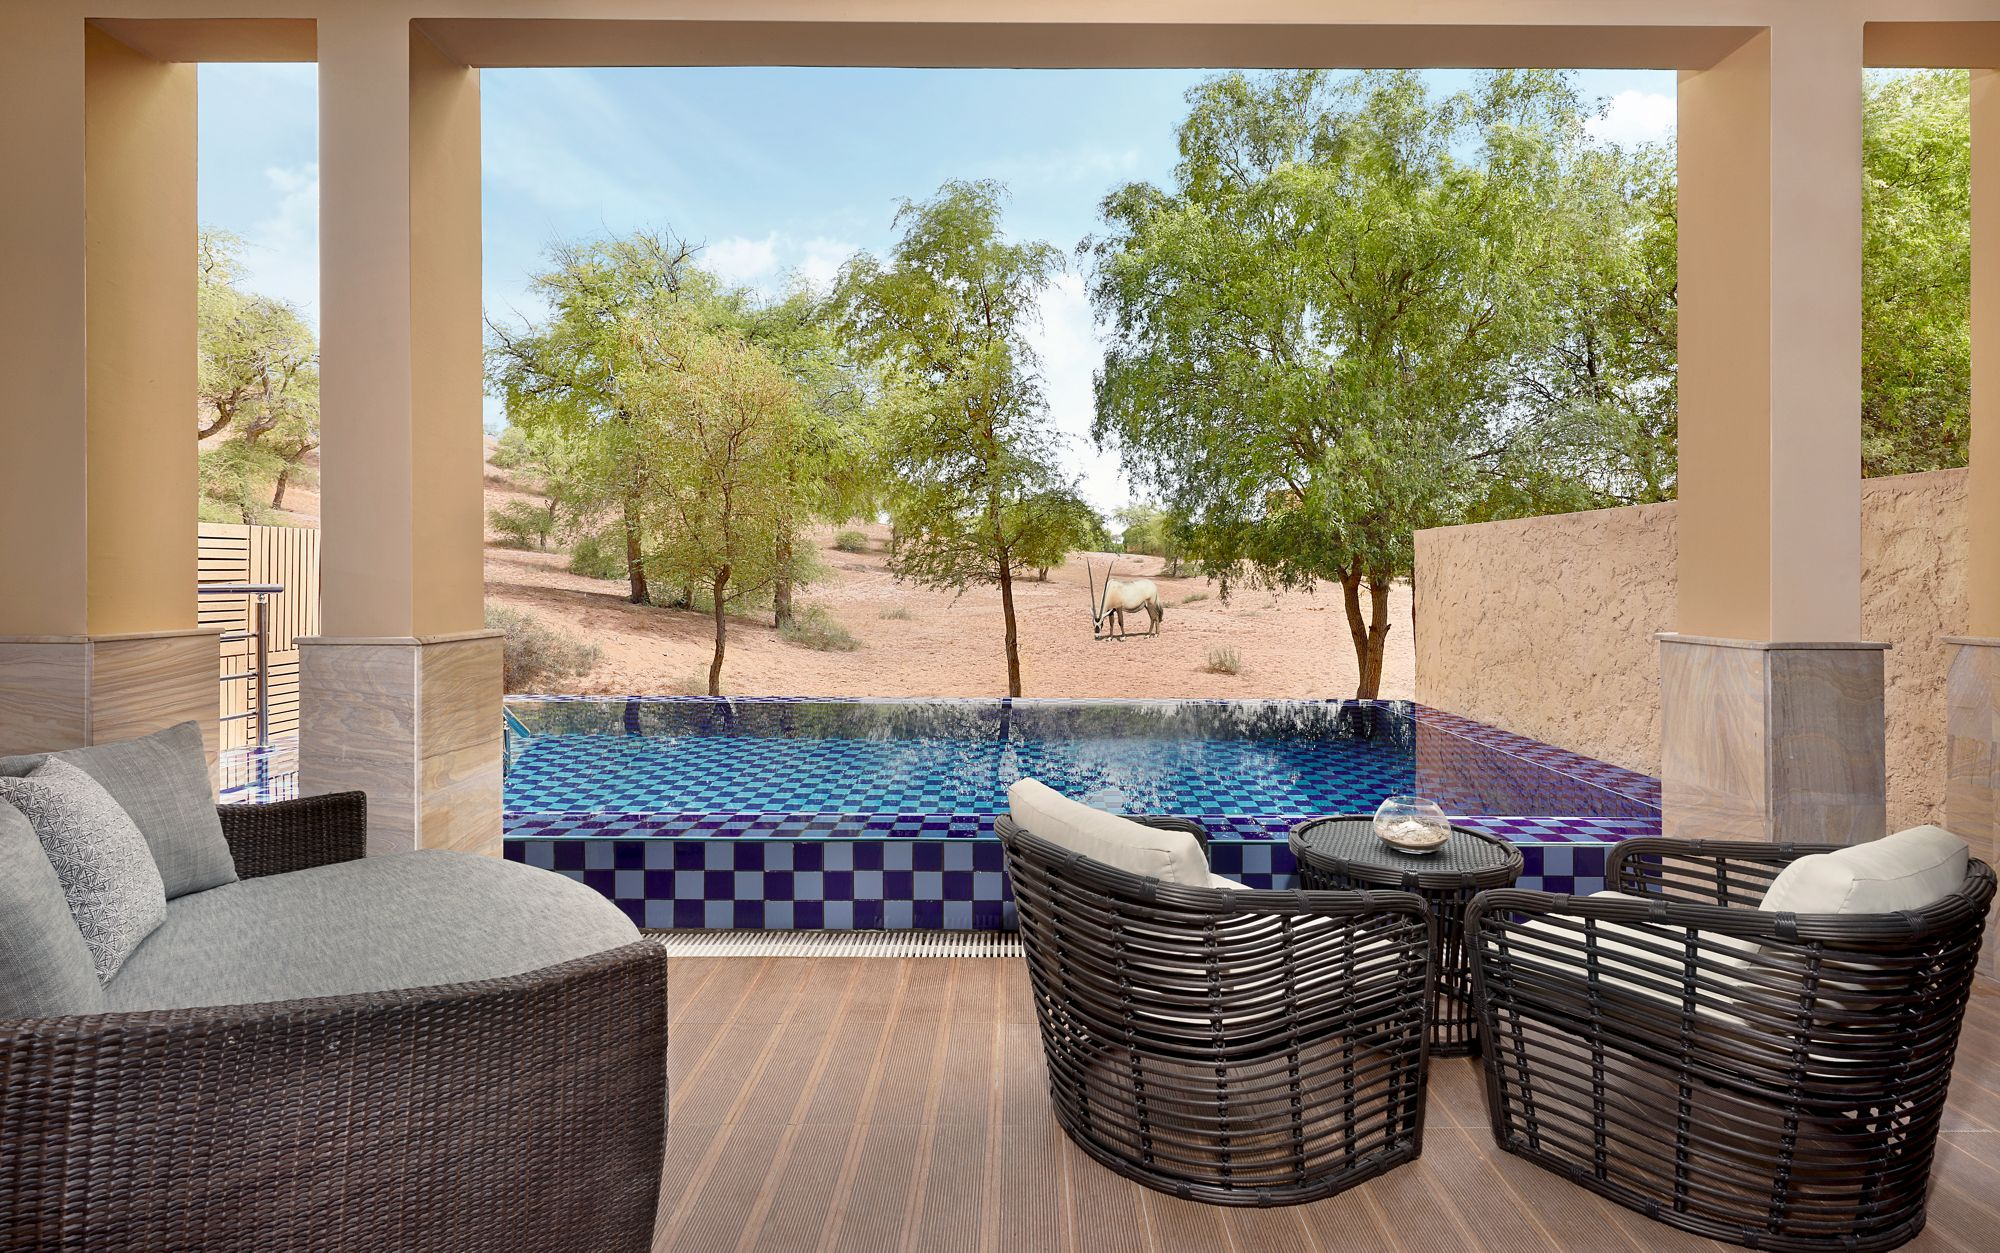 ritz-carlton-al-wadi-desert-suite